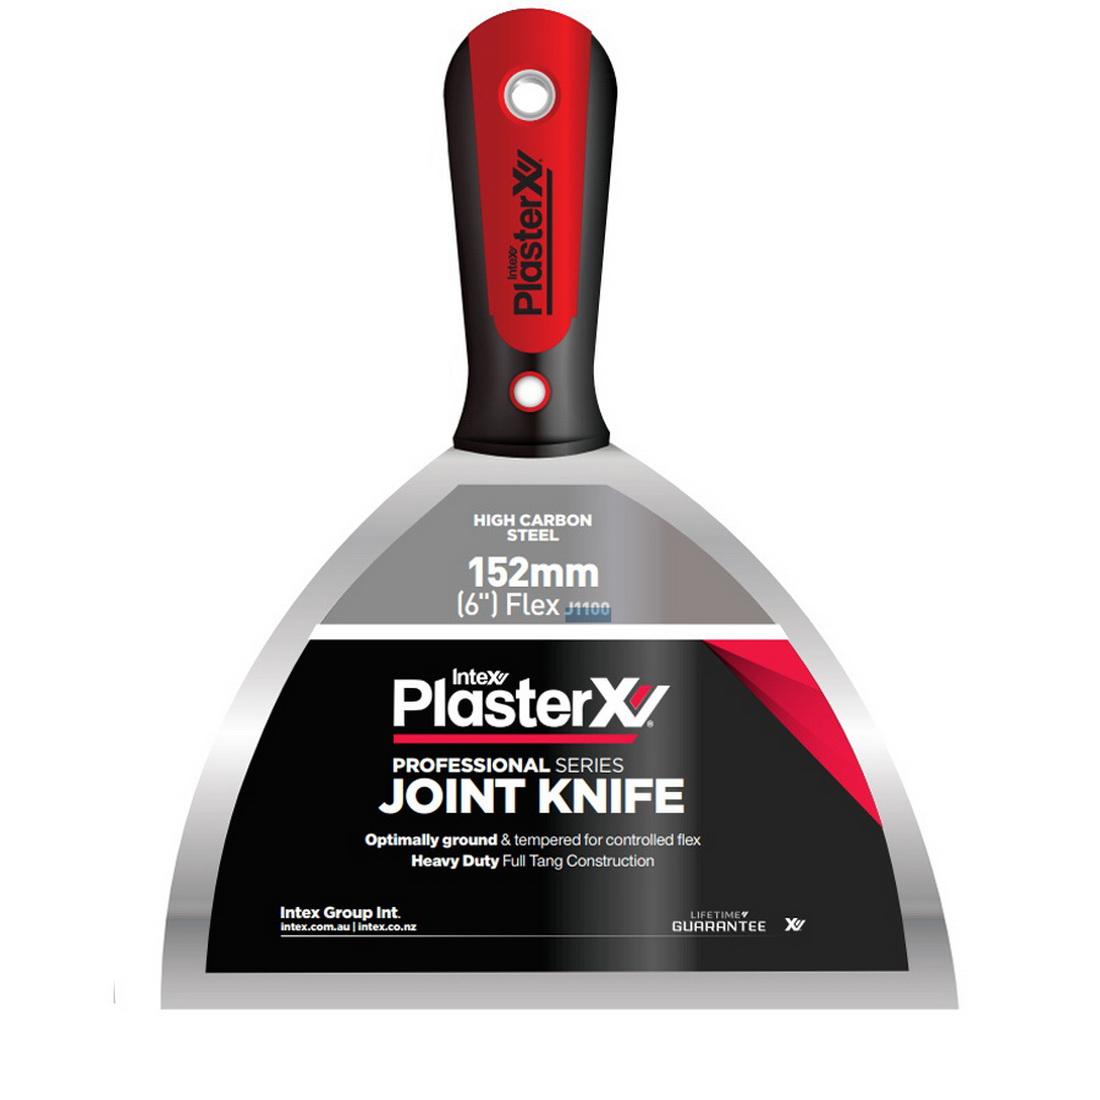 PlasterX MegaGrip Professional 152mm Flexible Joint Knife